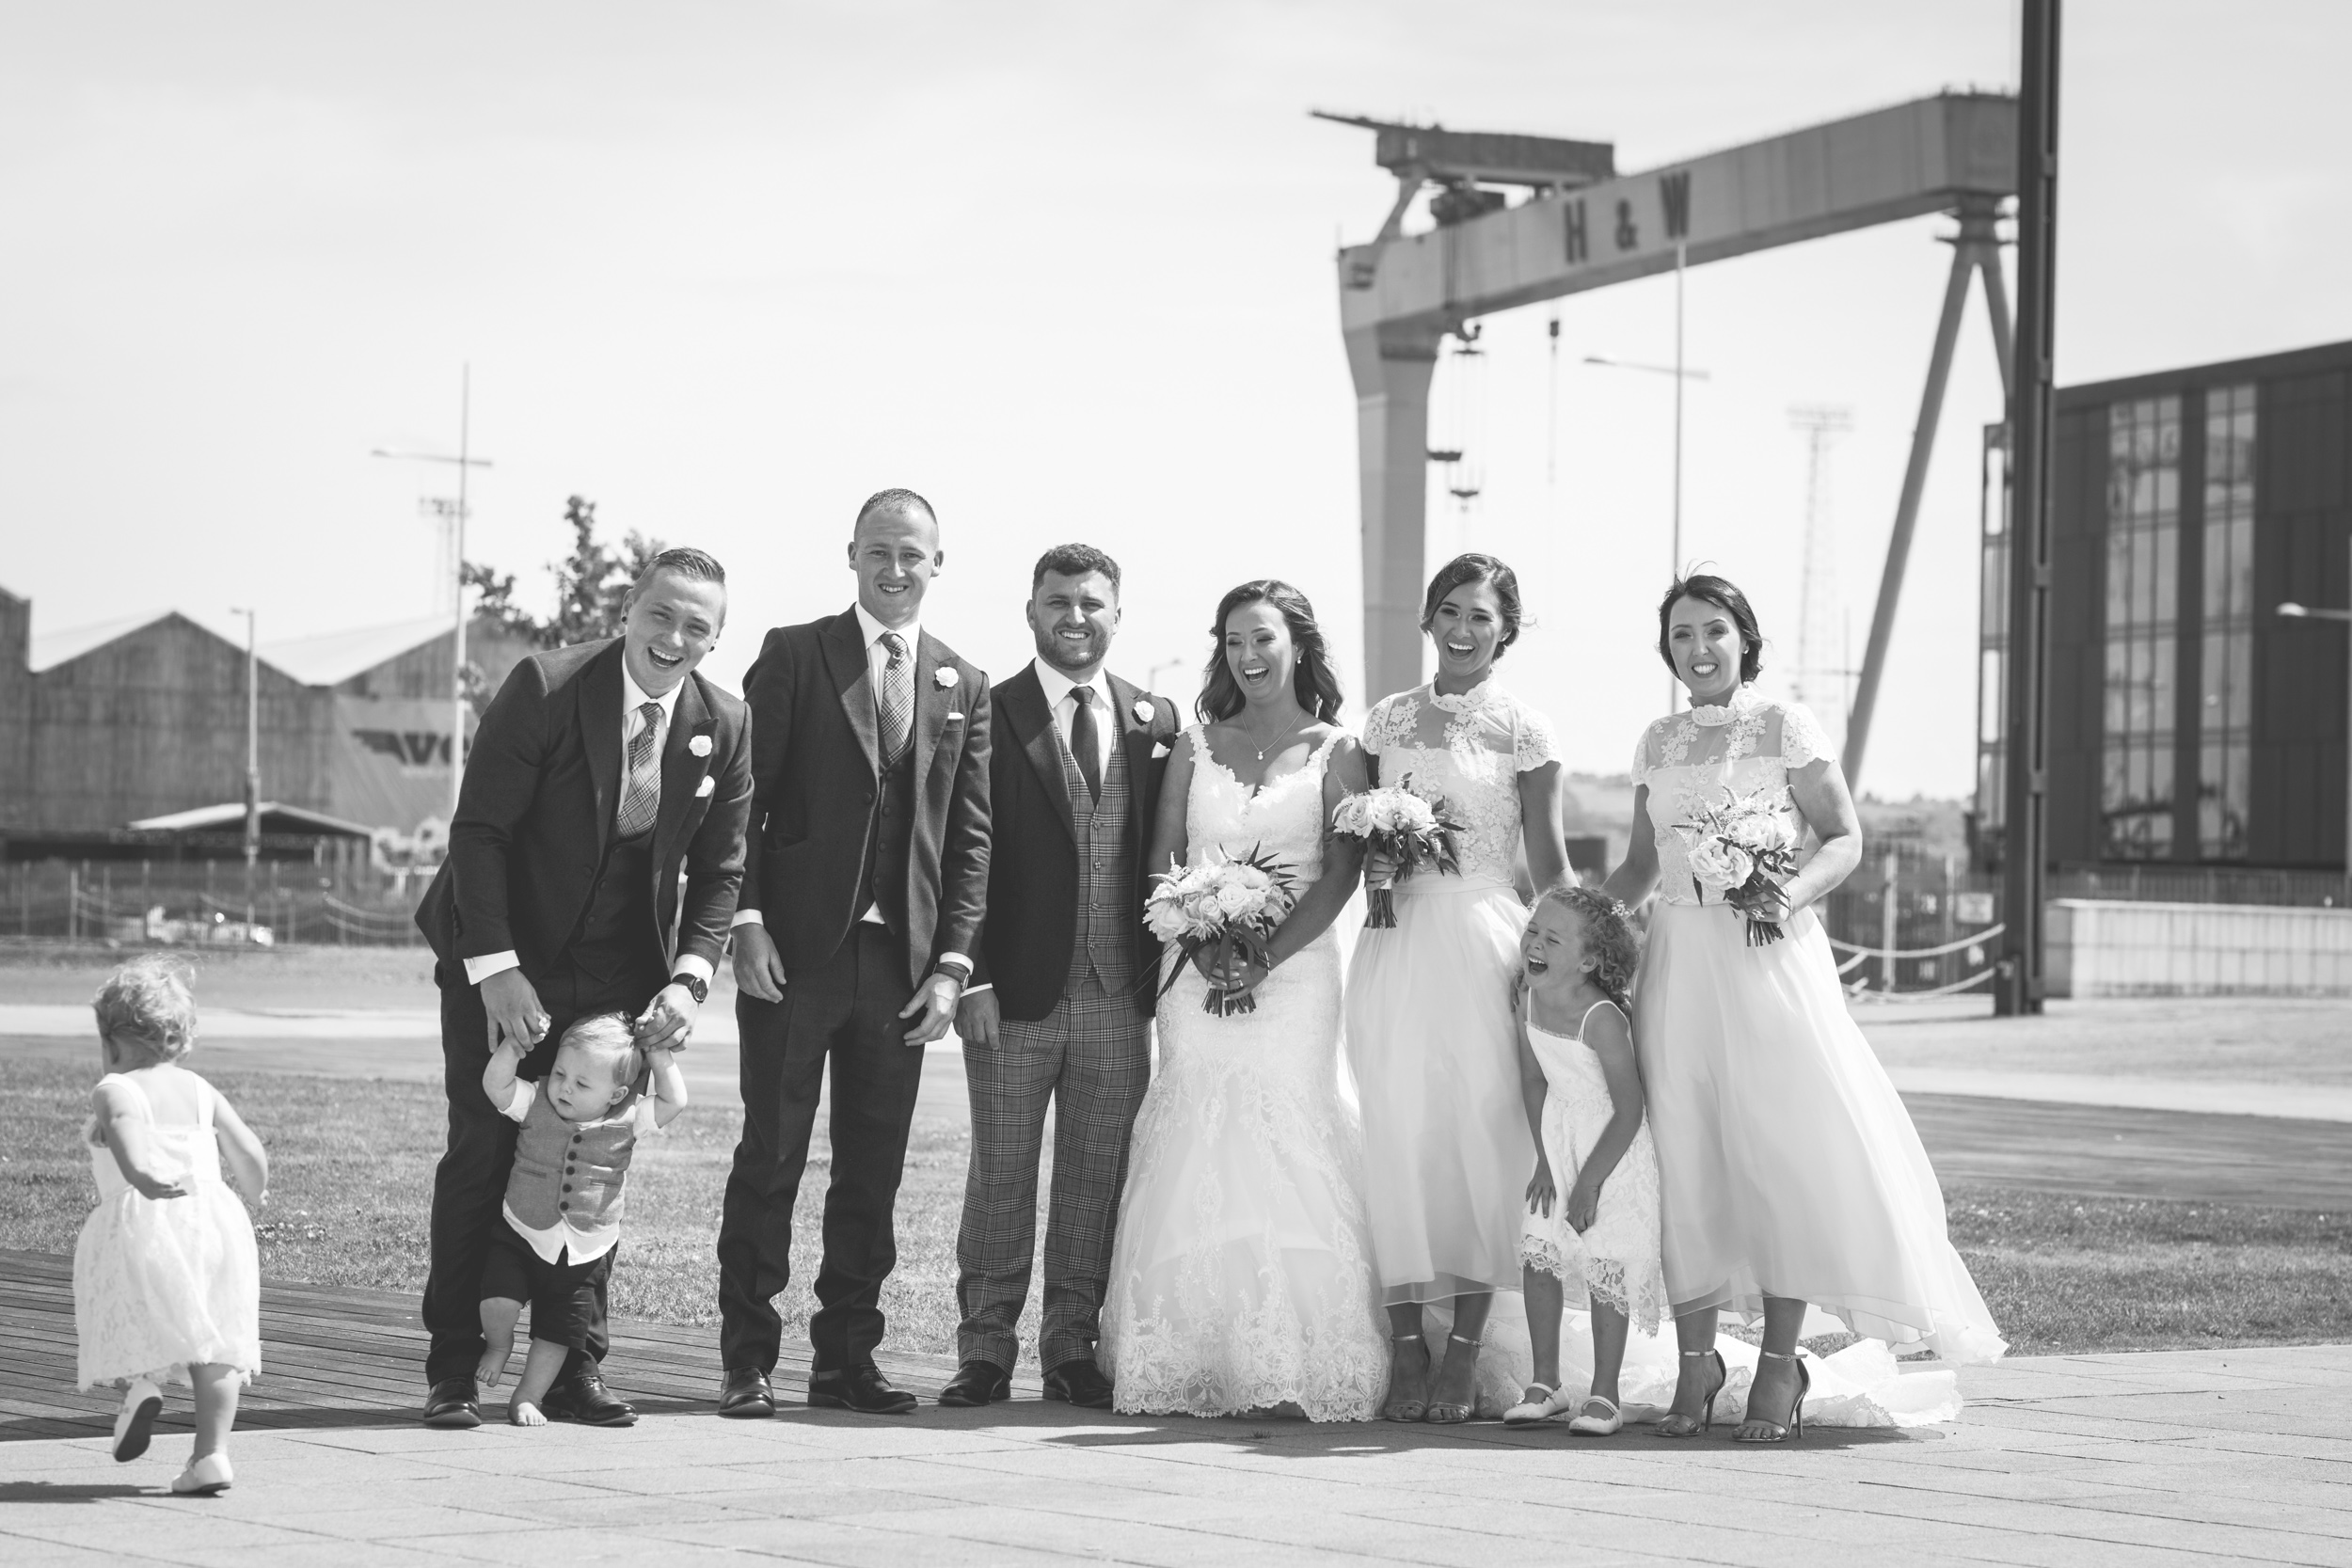 Brian McEwan   Northern Ireland Wedding Photographer   Rebecca & Michael   Portraits-52.jpg